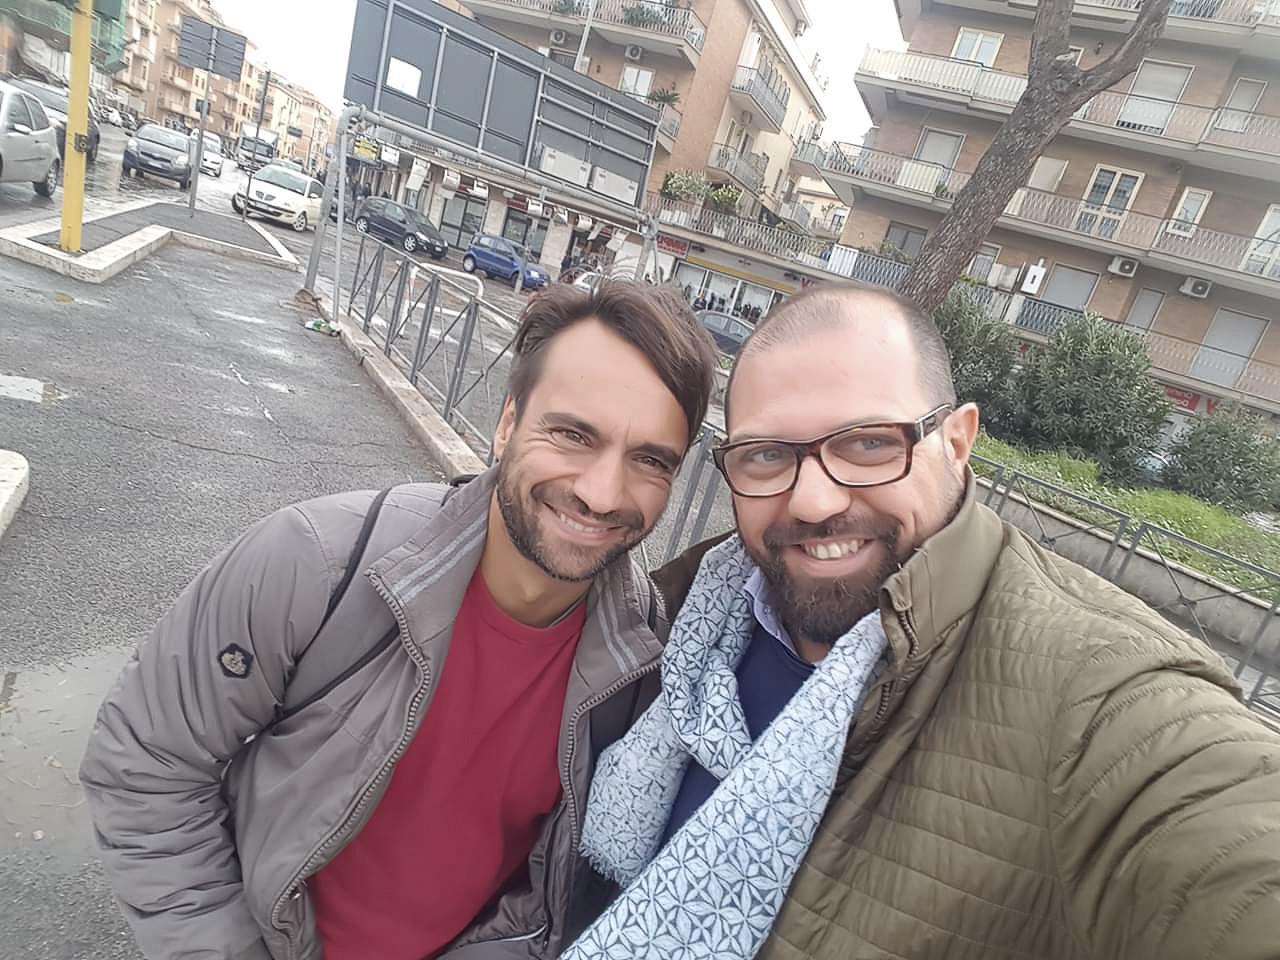 Corrado Cavarra e Daniele Nardi